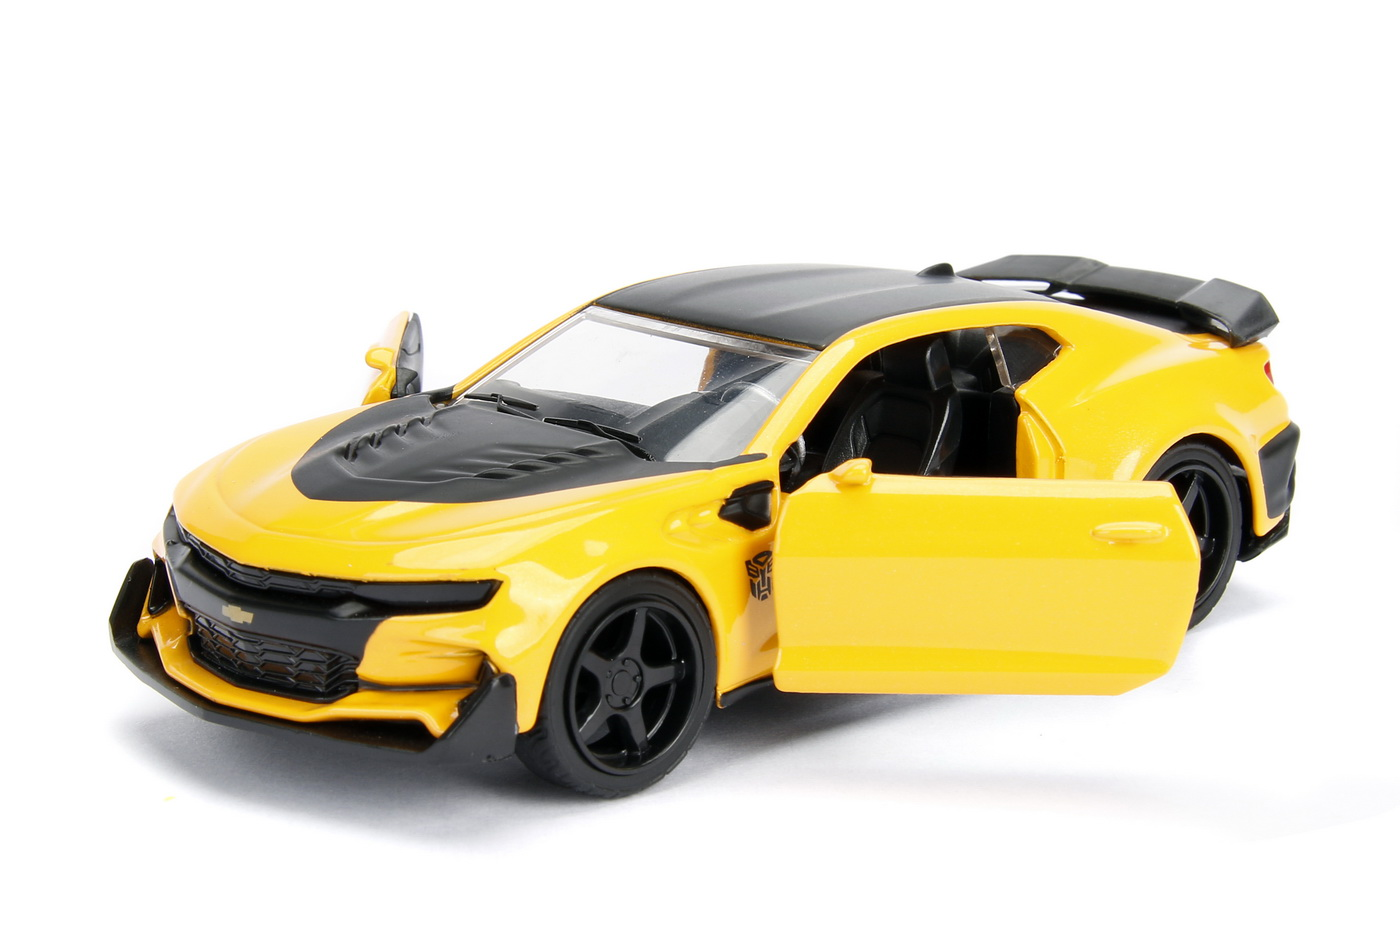 Masinuta Metalica Transformers 2016 Chevy Camaro Scara 1 La 32   JadaToys - 6